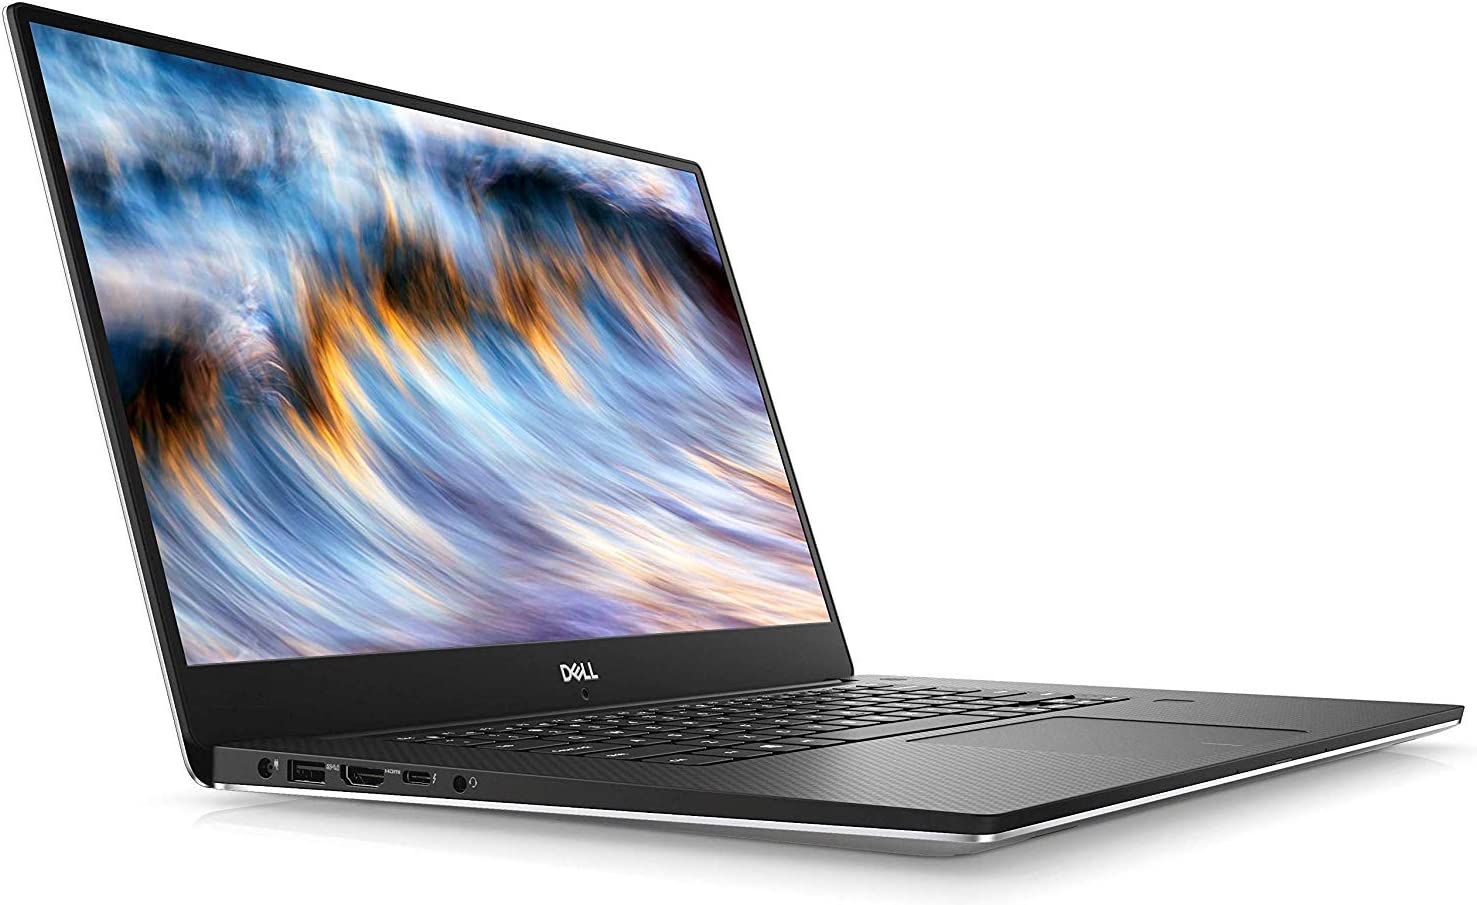 "Premium 2019 Dell XPS 15 9570 15.6"" Full HD IPS Anti-Glare InfinityEdge Business Laptop Intel Quad-Core i5-8300H 16GB RAM 512GB PCIe SSD 1TB HDD MaxxAudio Backlit Keyboard Thunderbolt HDMI Win 10"